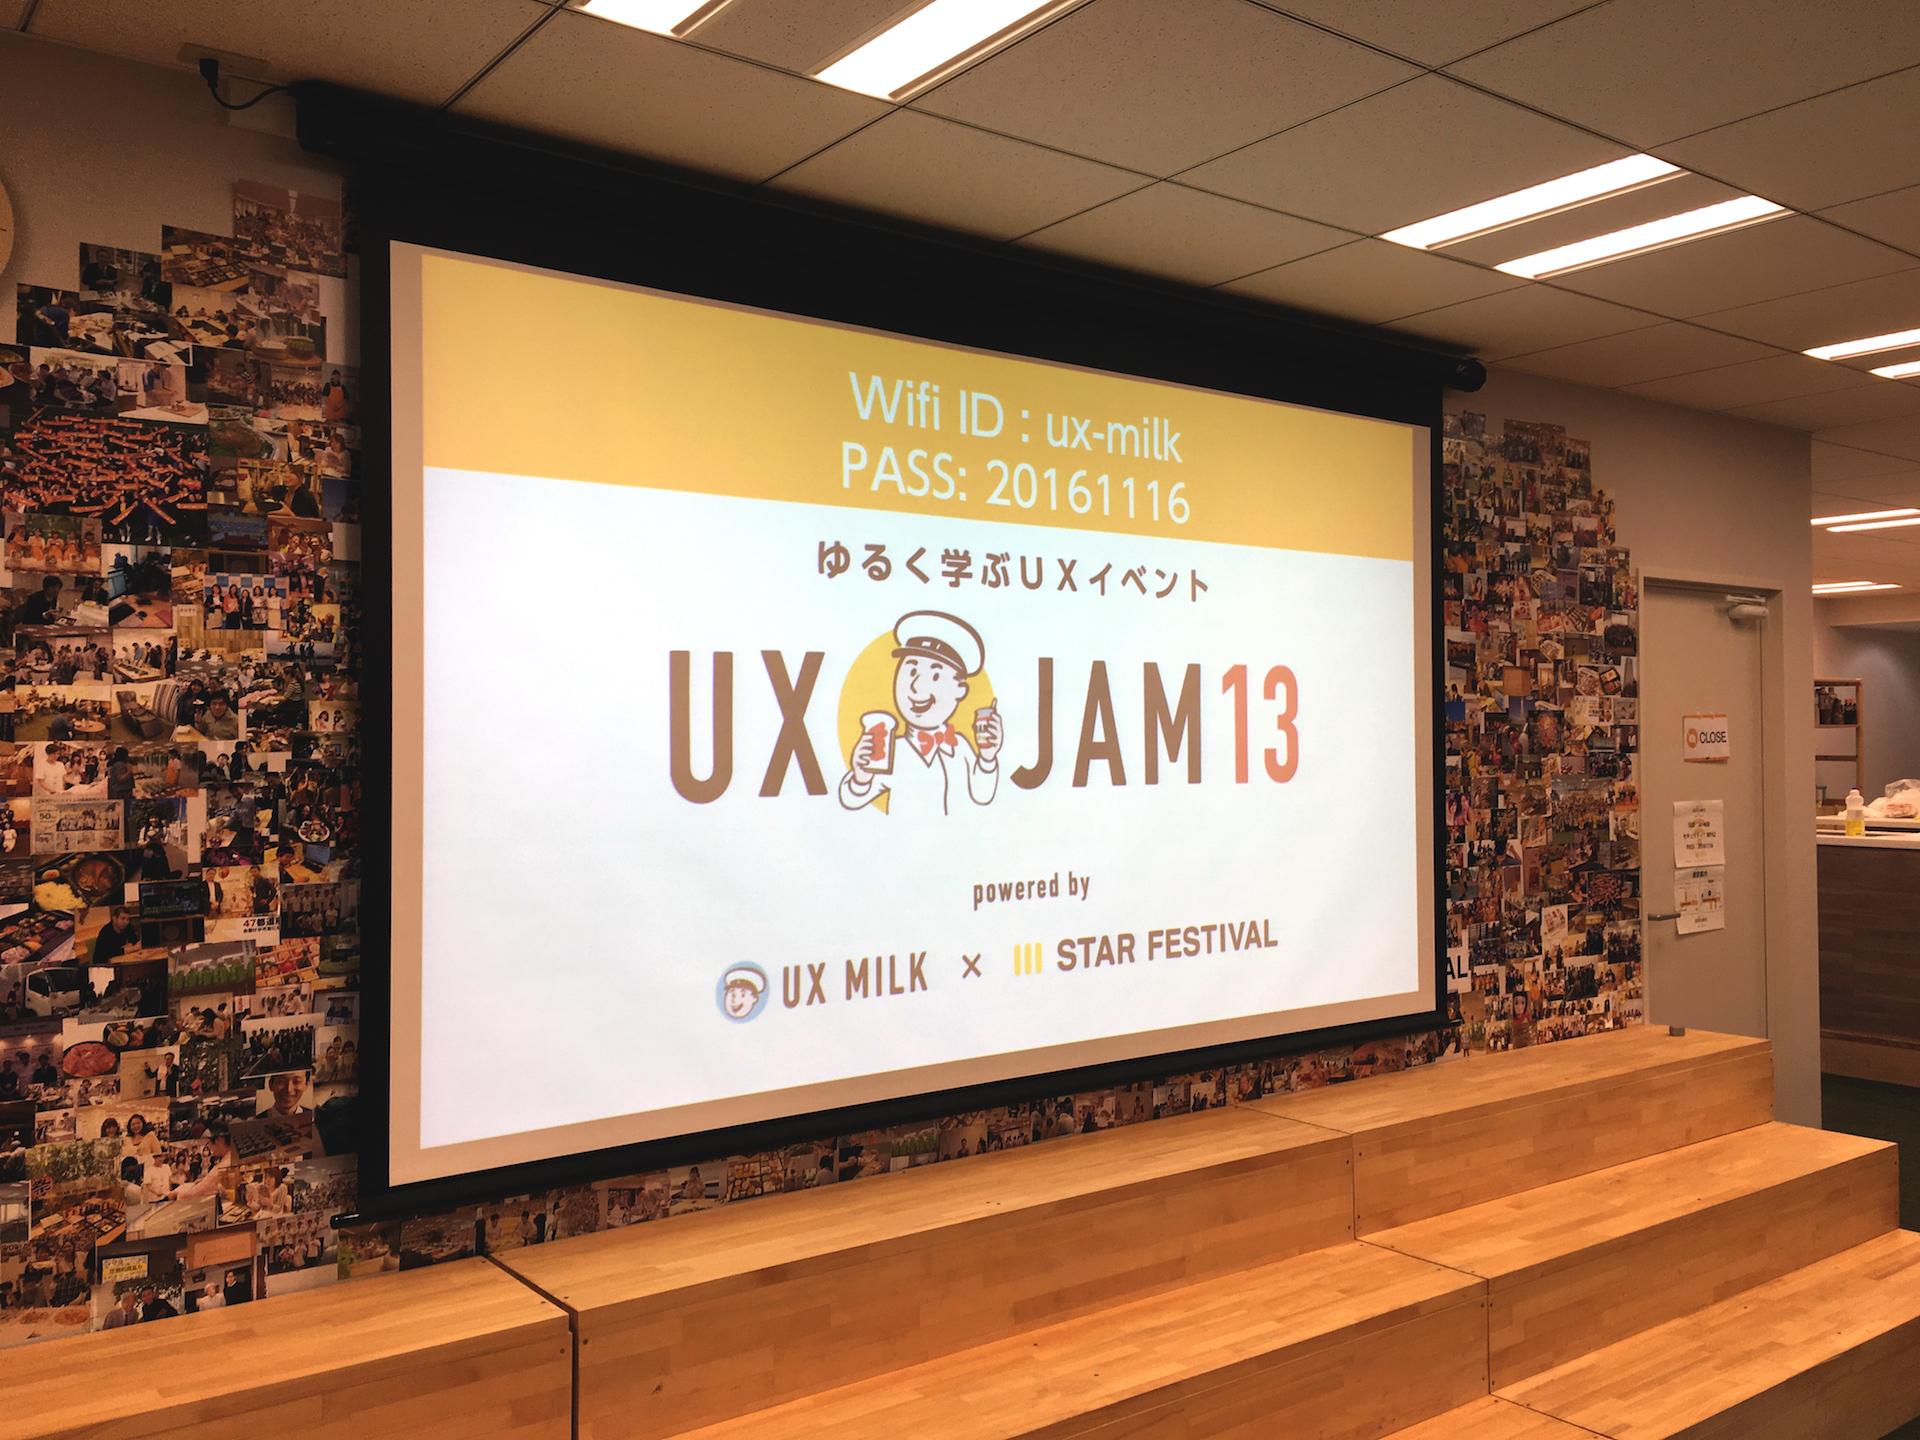 UX JAM #13 LTに登壇してUXを語る